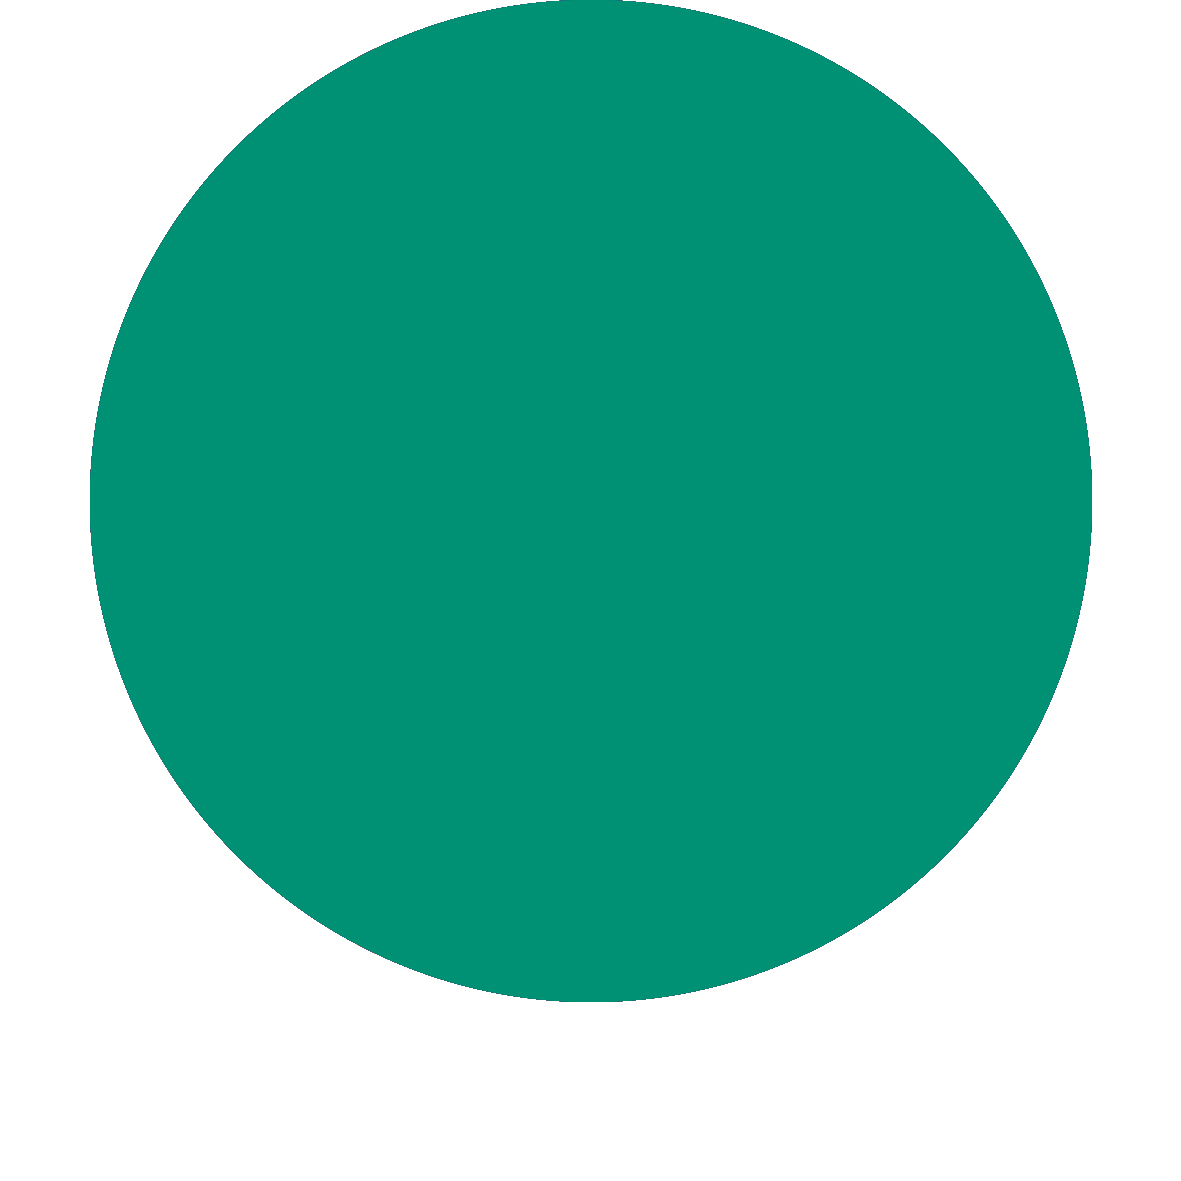 C.I. Green 7(UNL6700) -